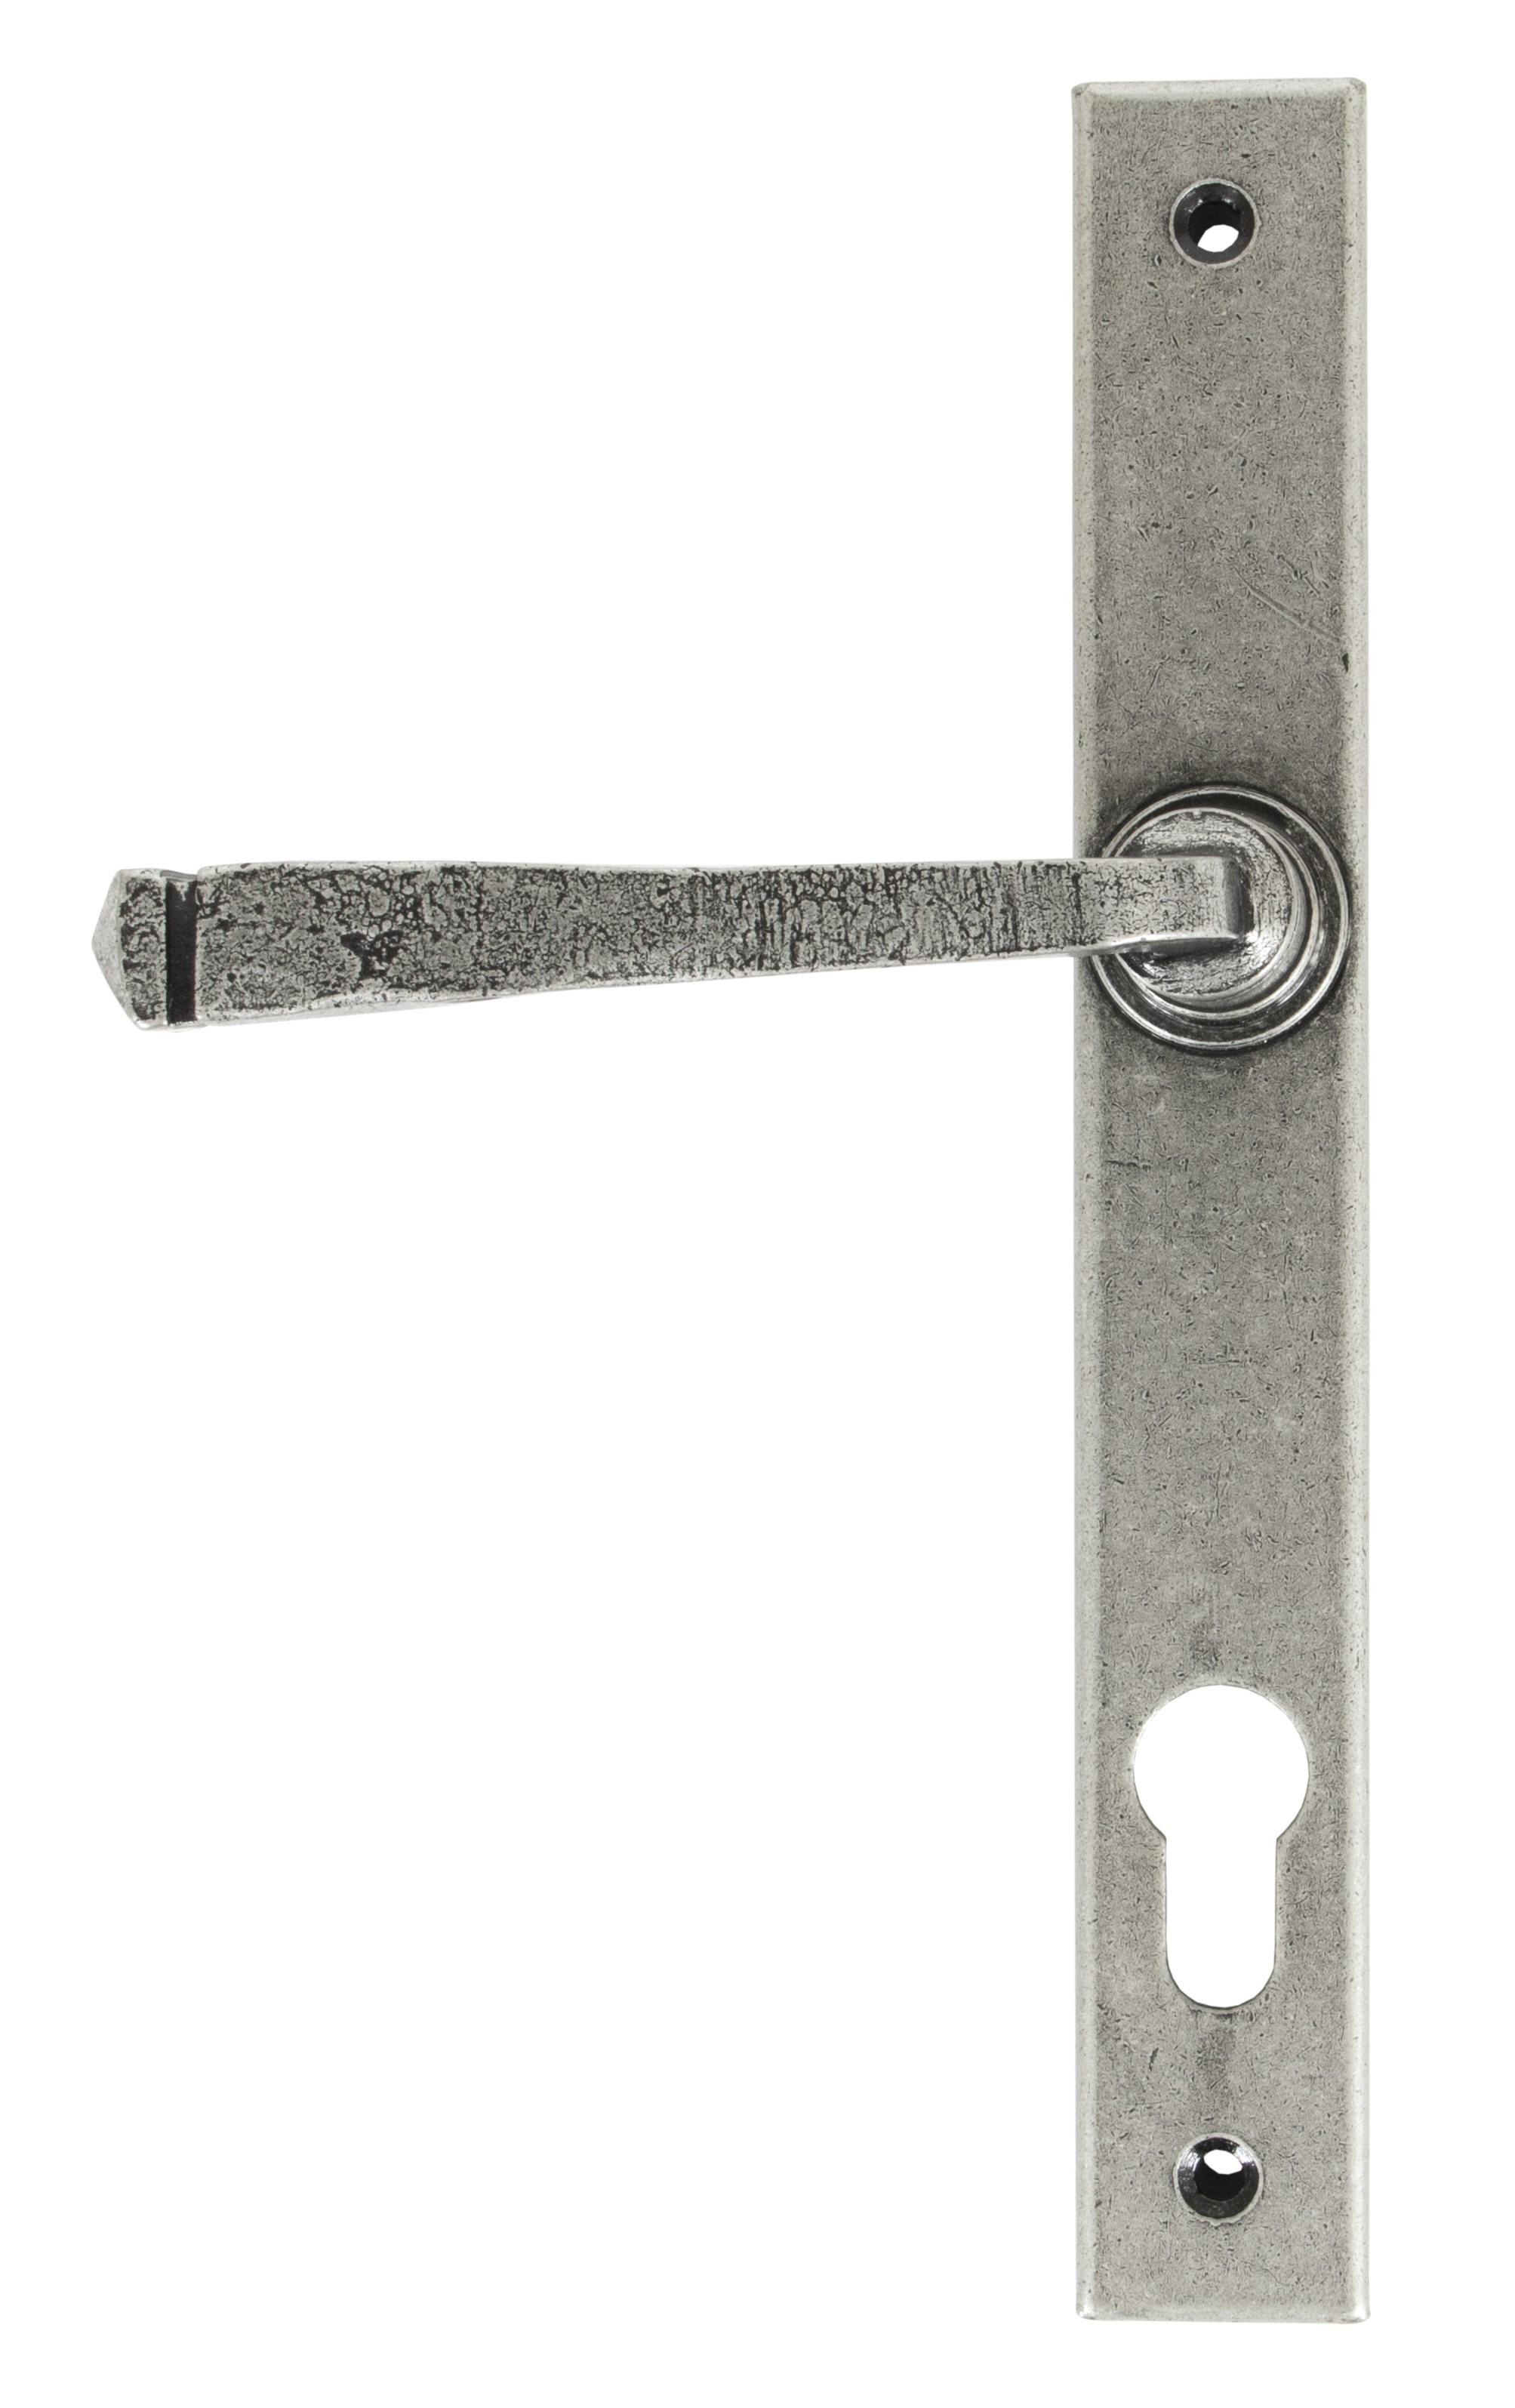 ANVIL - Avon Slimline Lever Espag. Lock Set - Pewter Patina